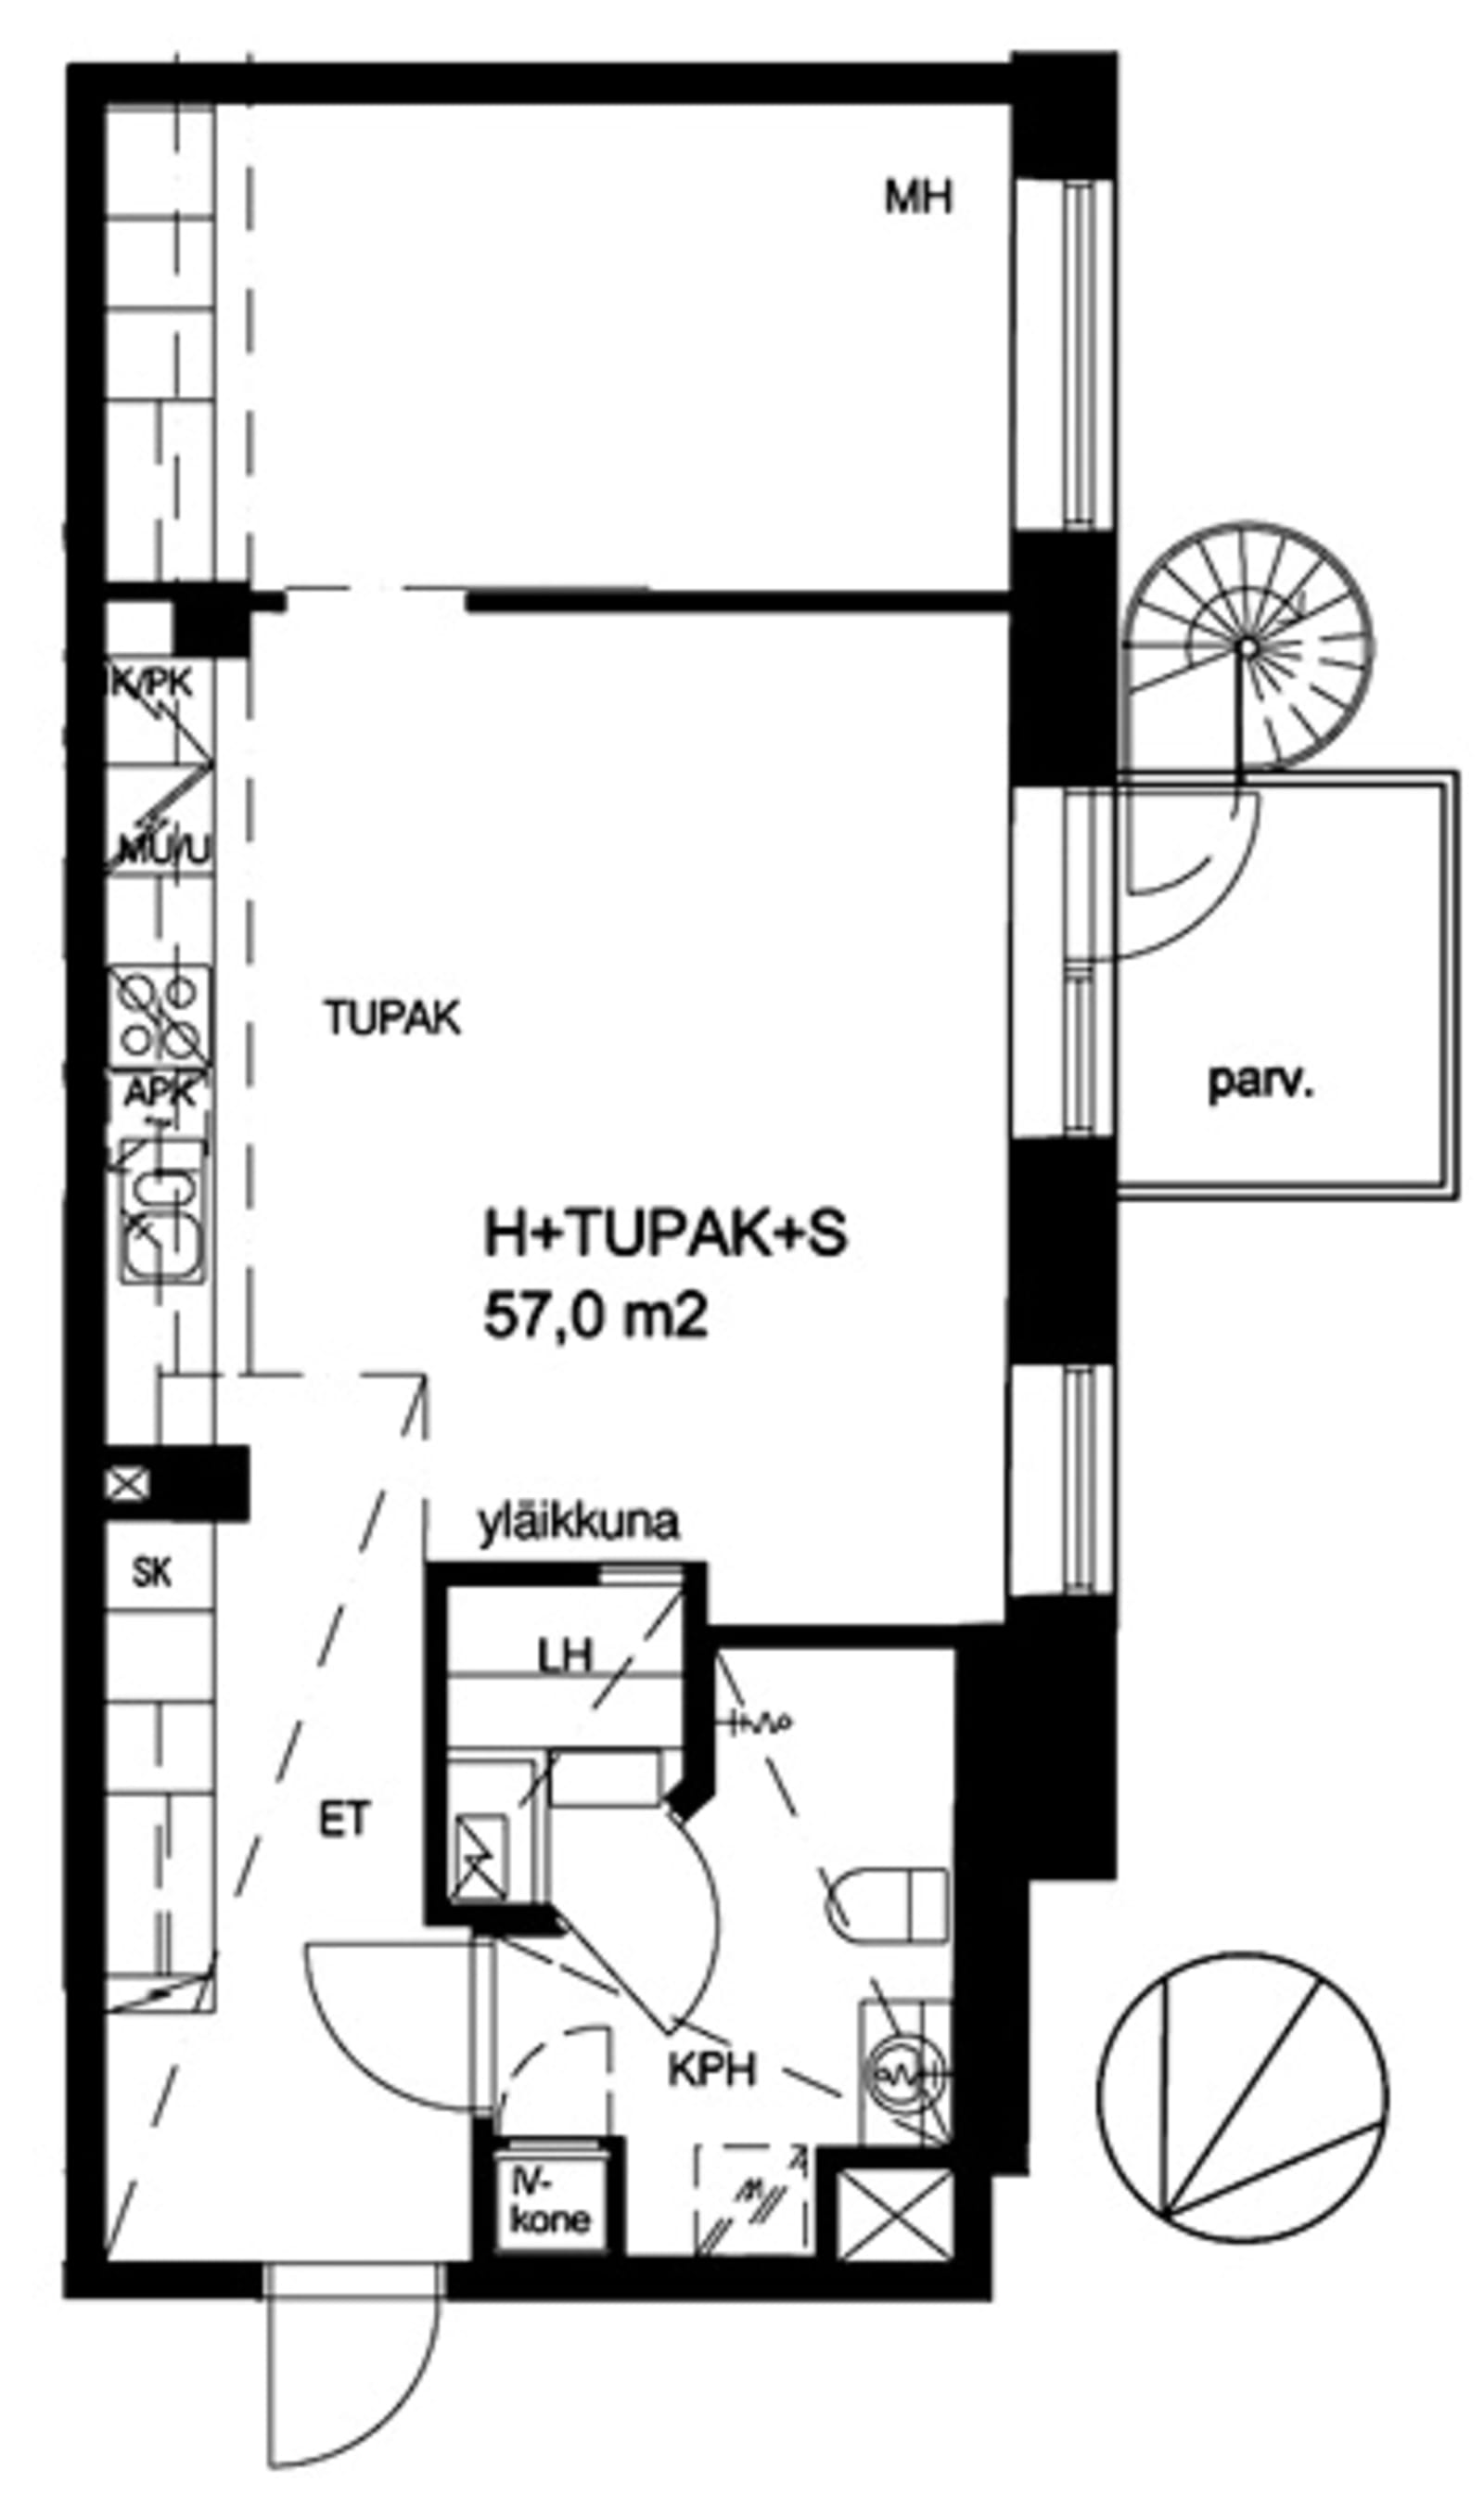 Helsinki, Kamppi, Lönnrotinkatu 32 A 005